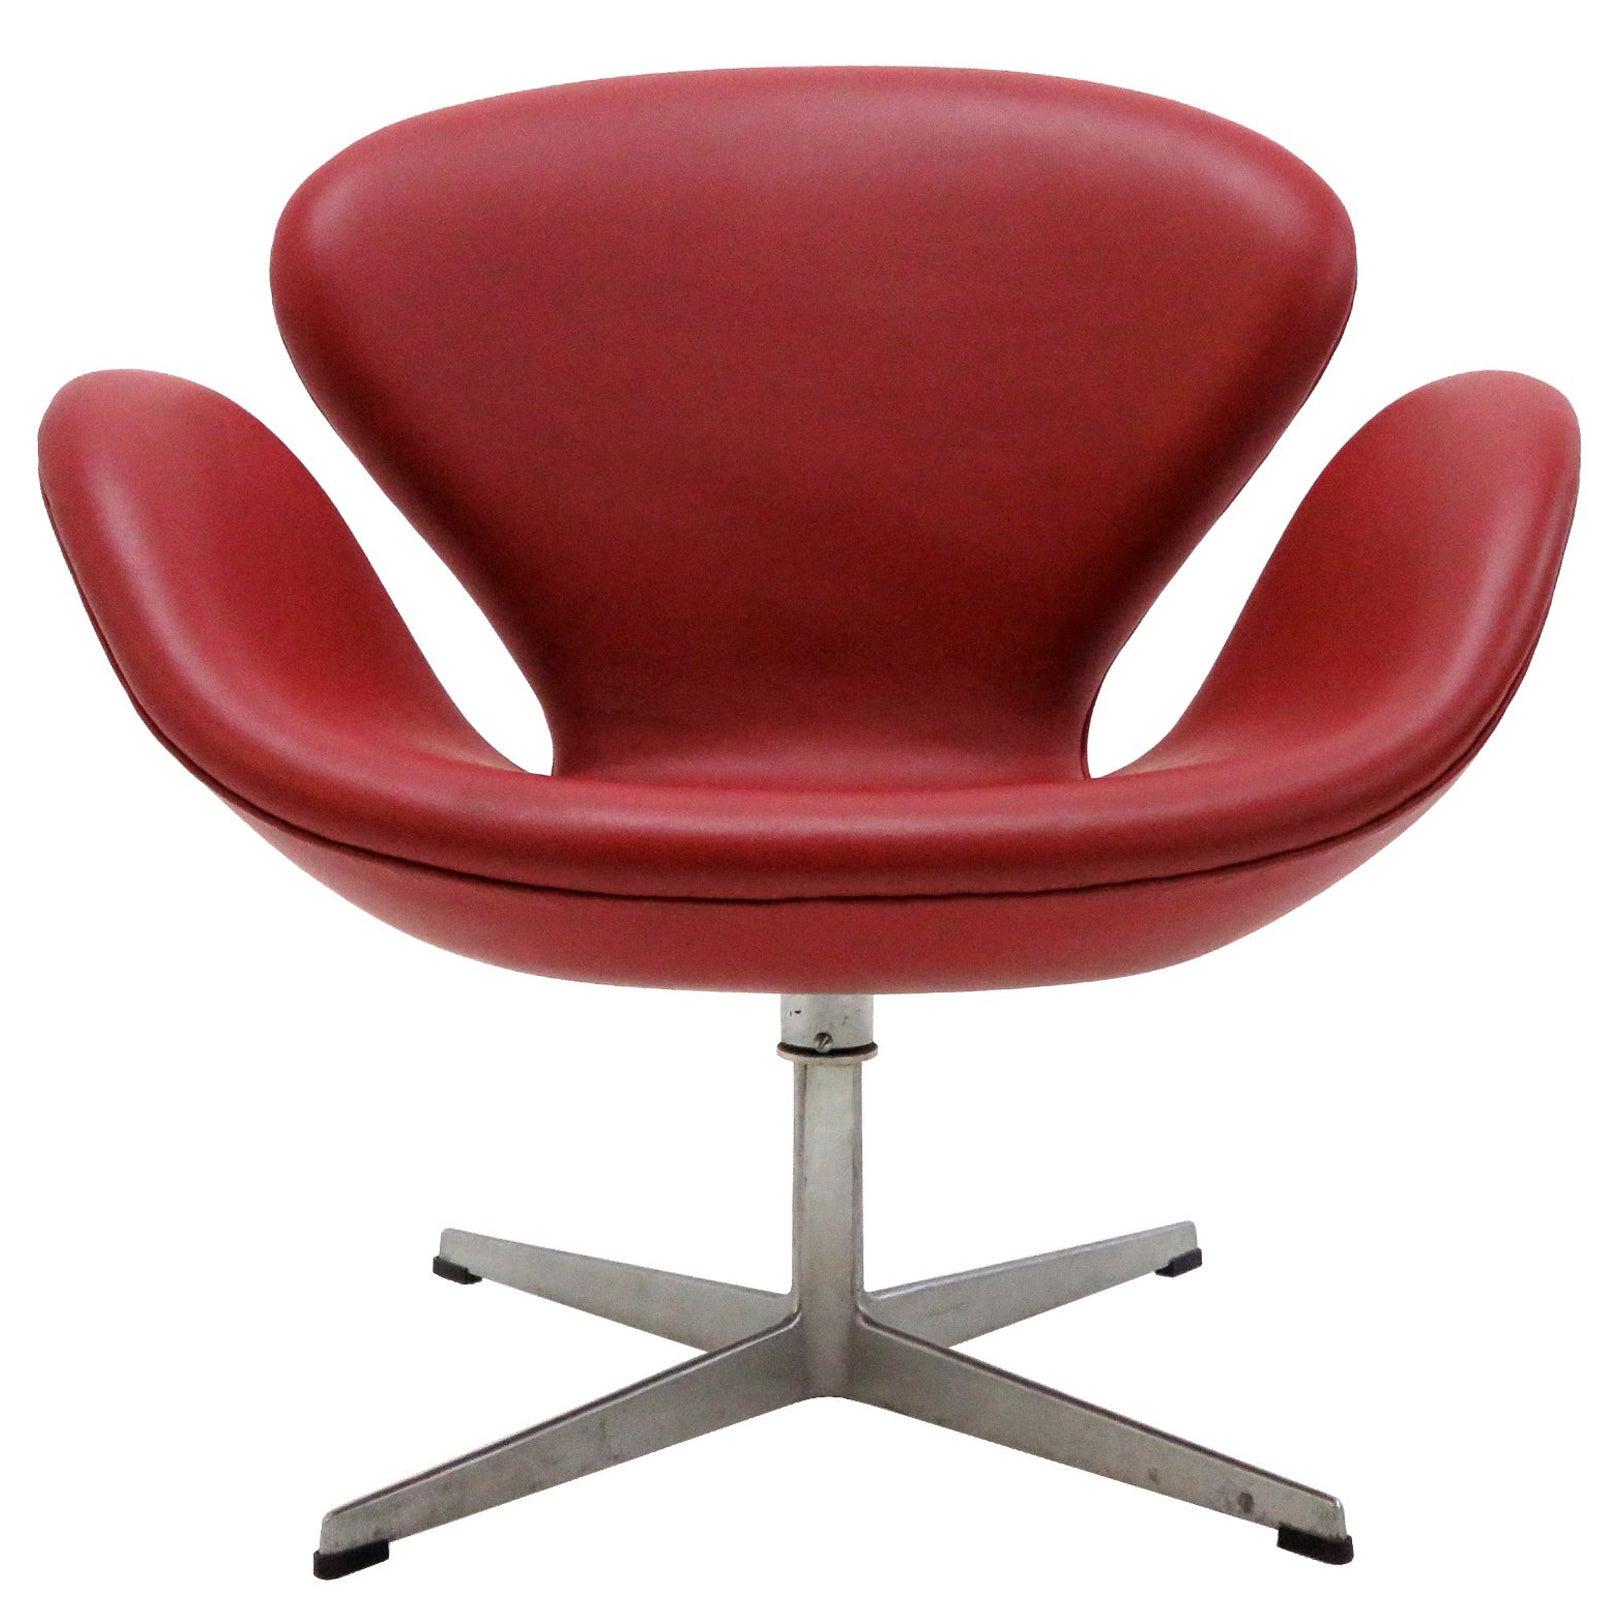 Early Arne Jacobsen 'Swan Chair' by Fritz Hansen